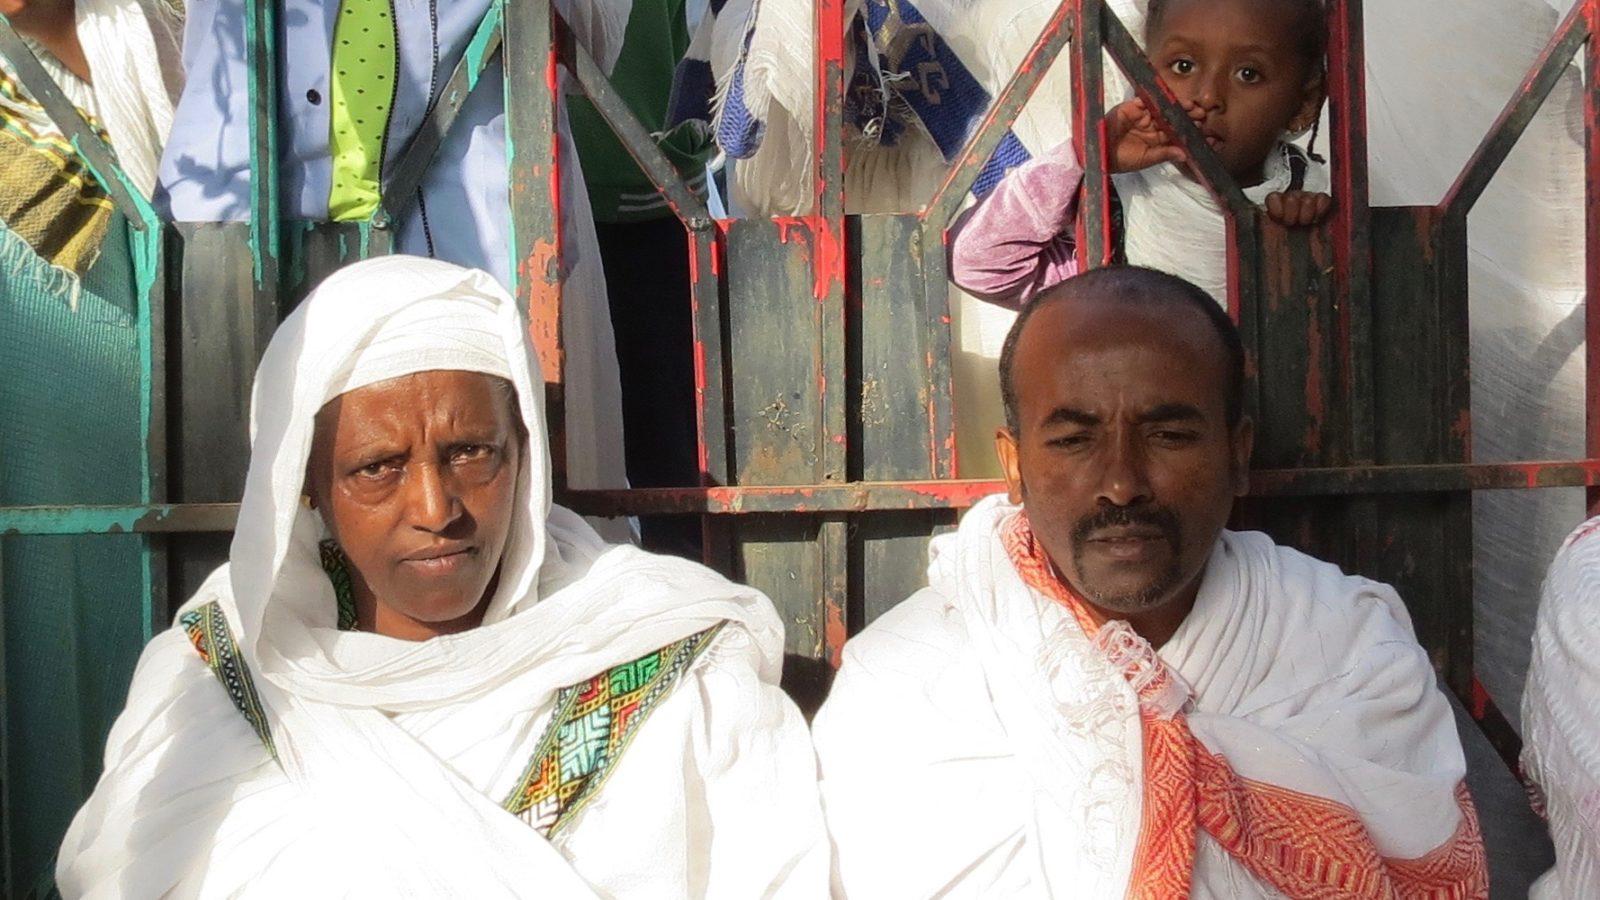 reis op maat naar Ethiopië